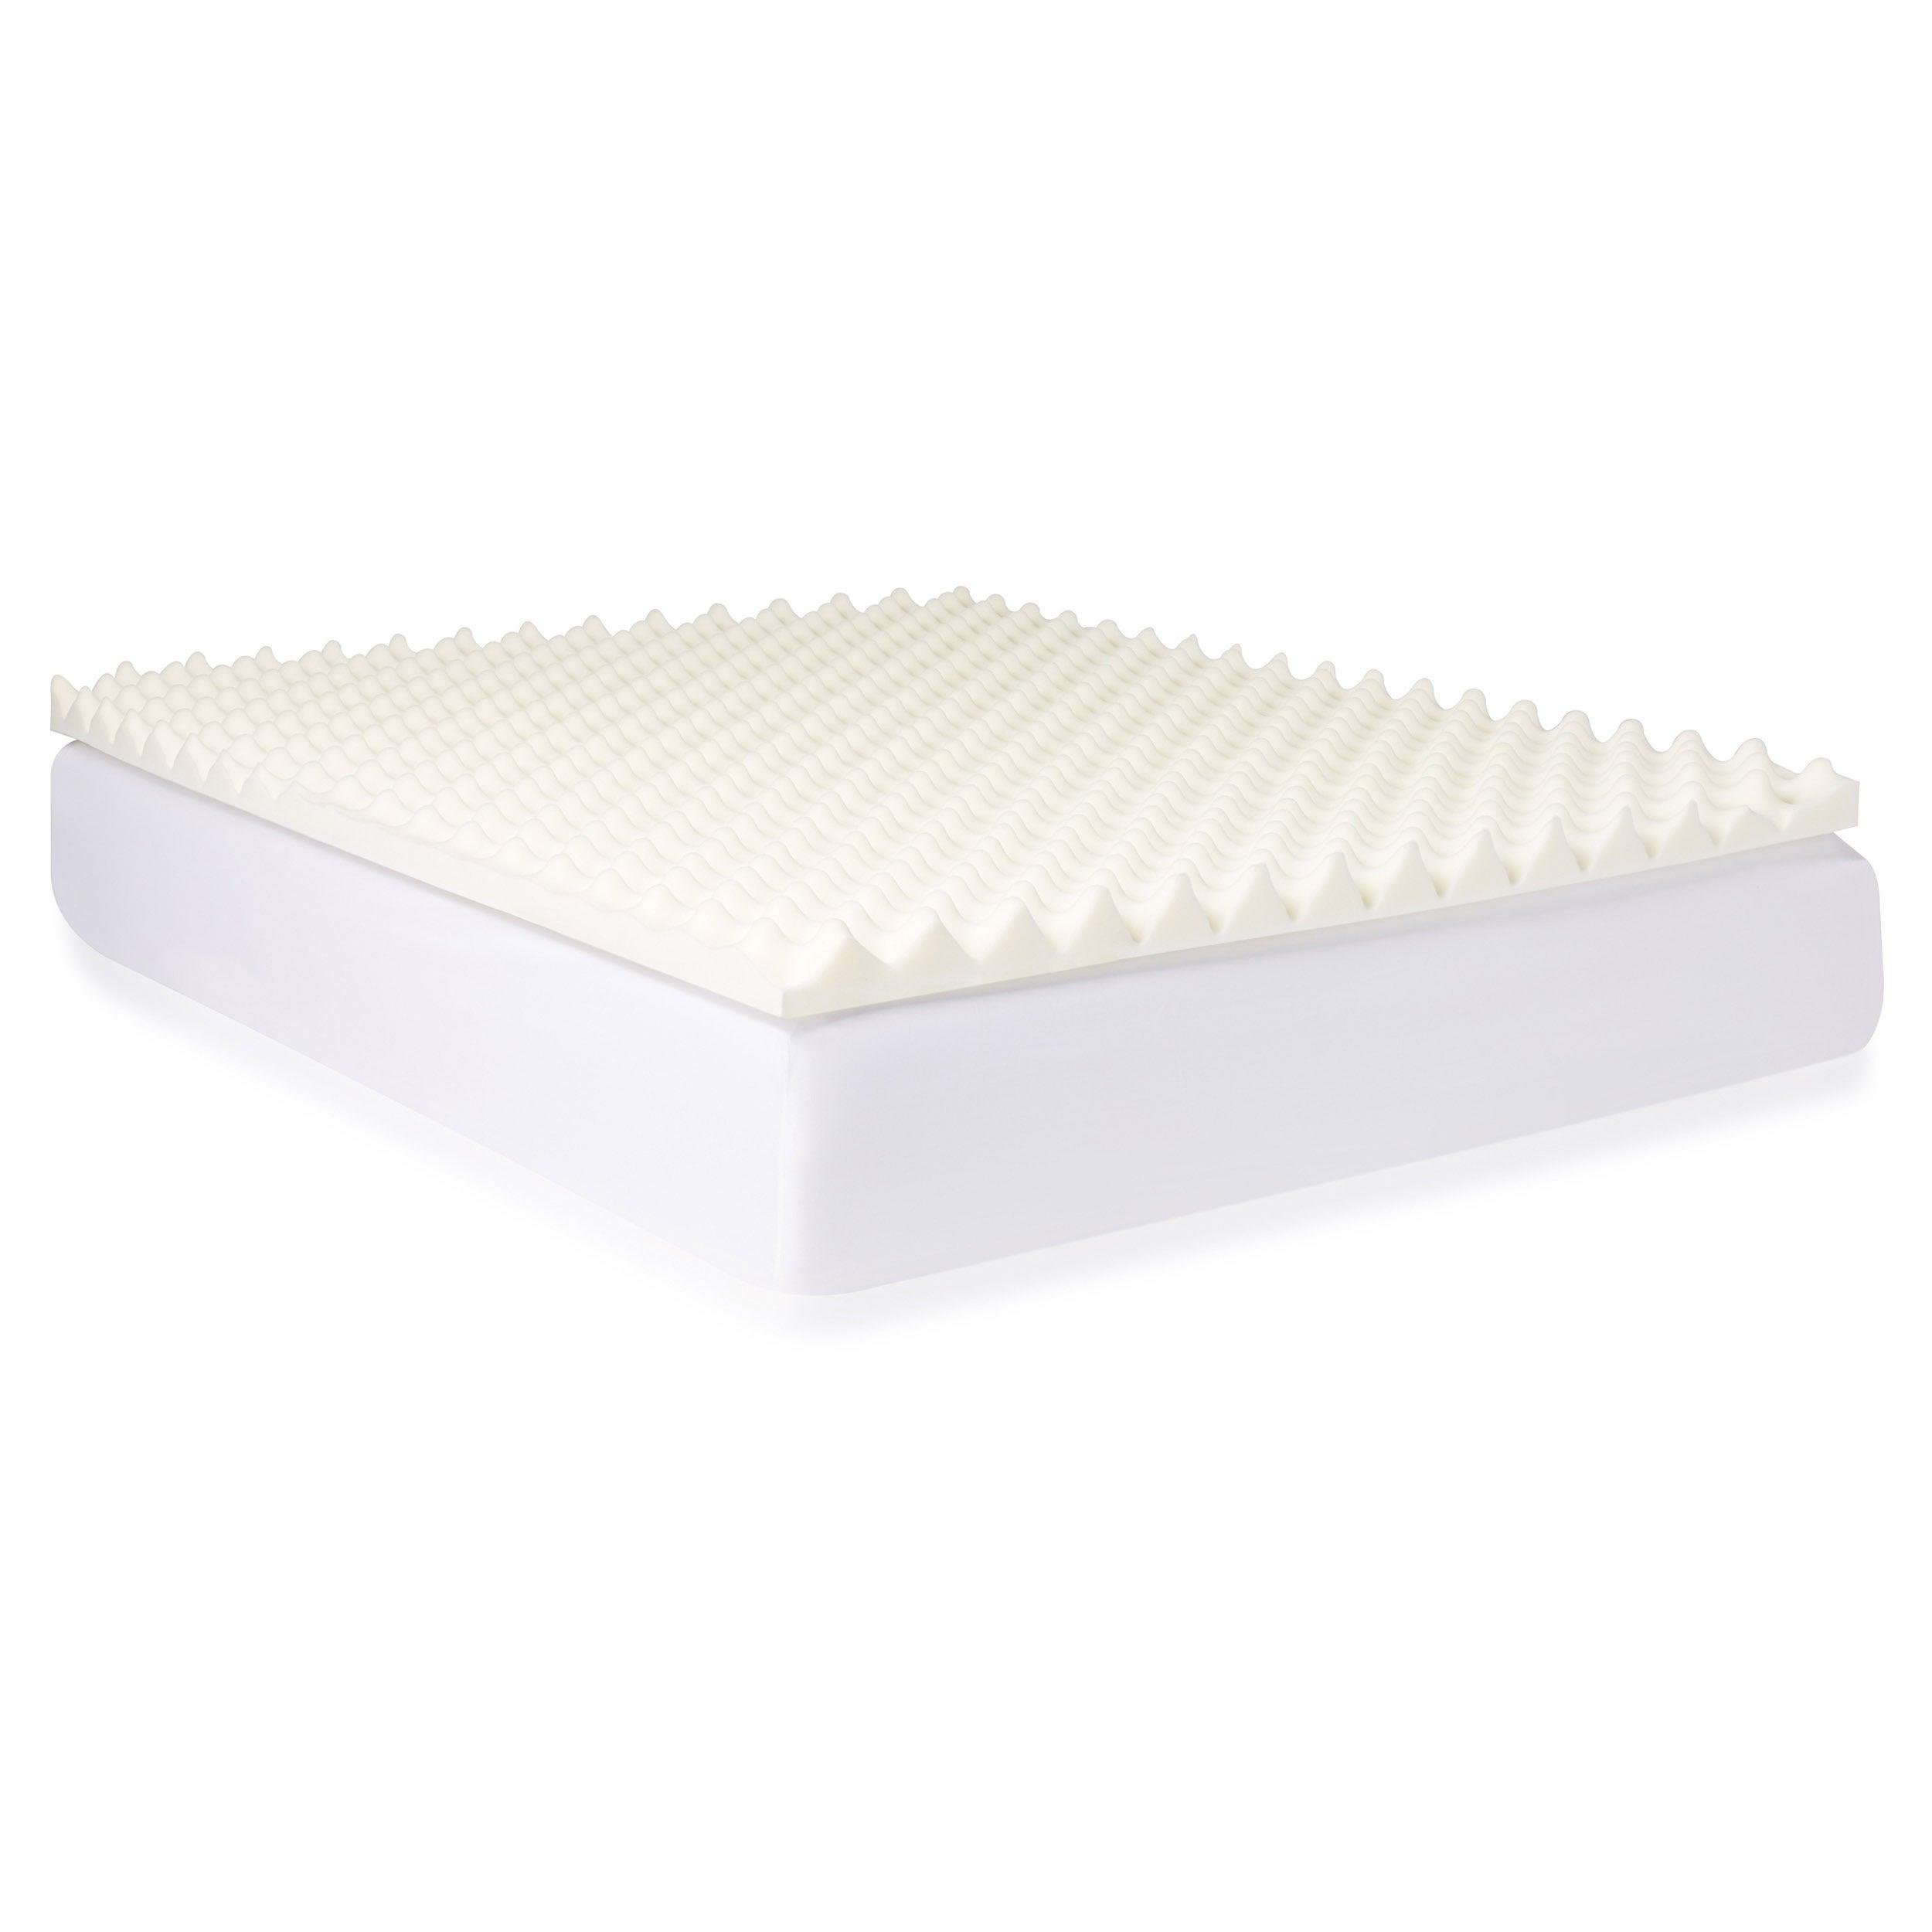 Slumber Pet Big Bump 3-inch Memory Foam Mattress Topper (...